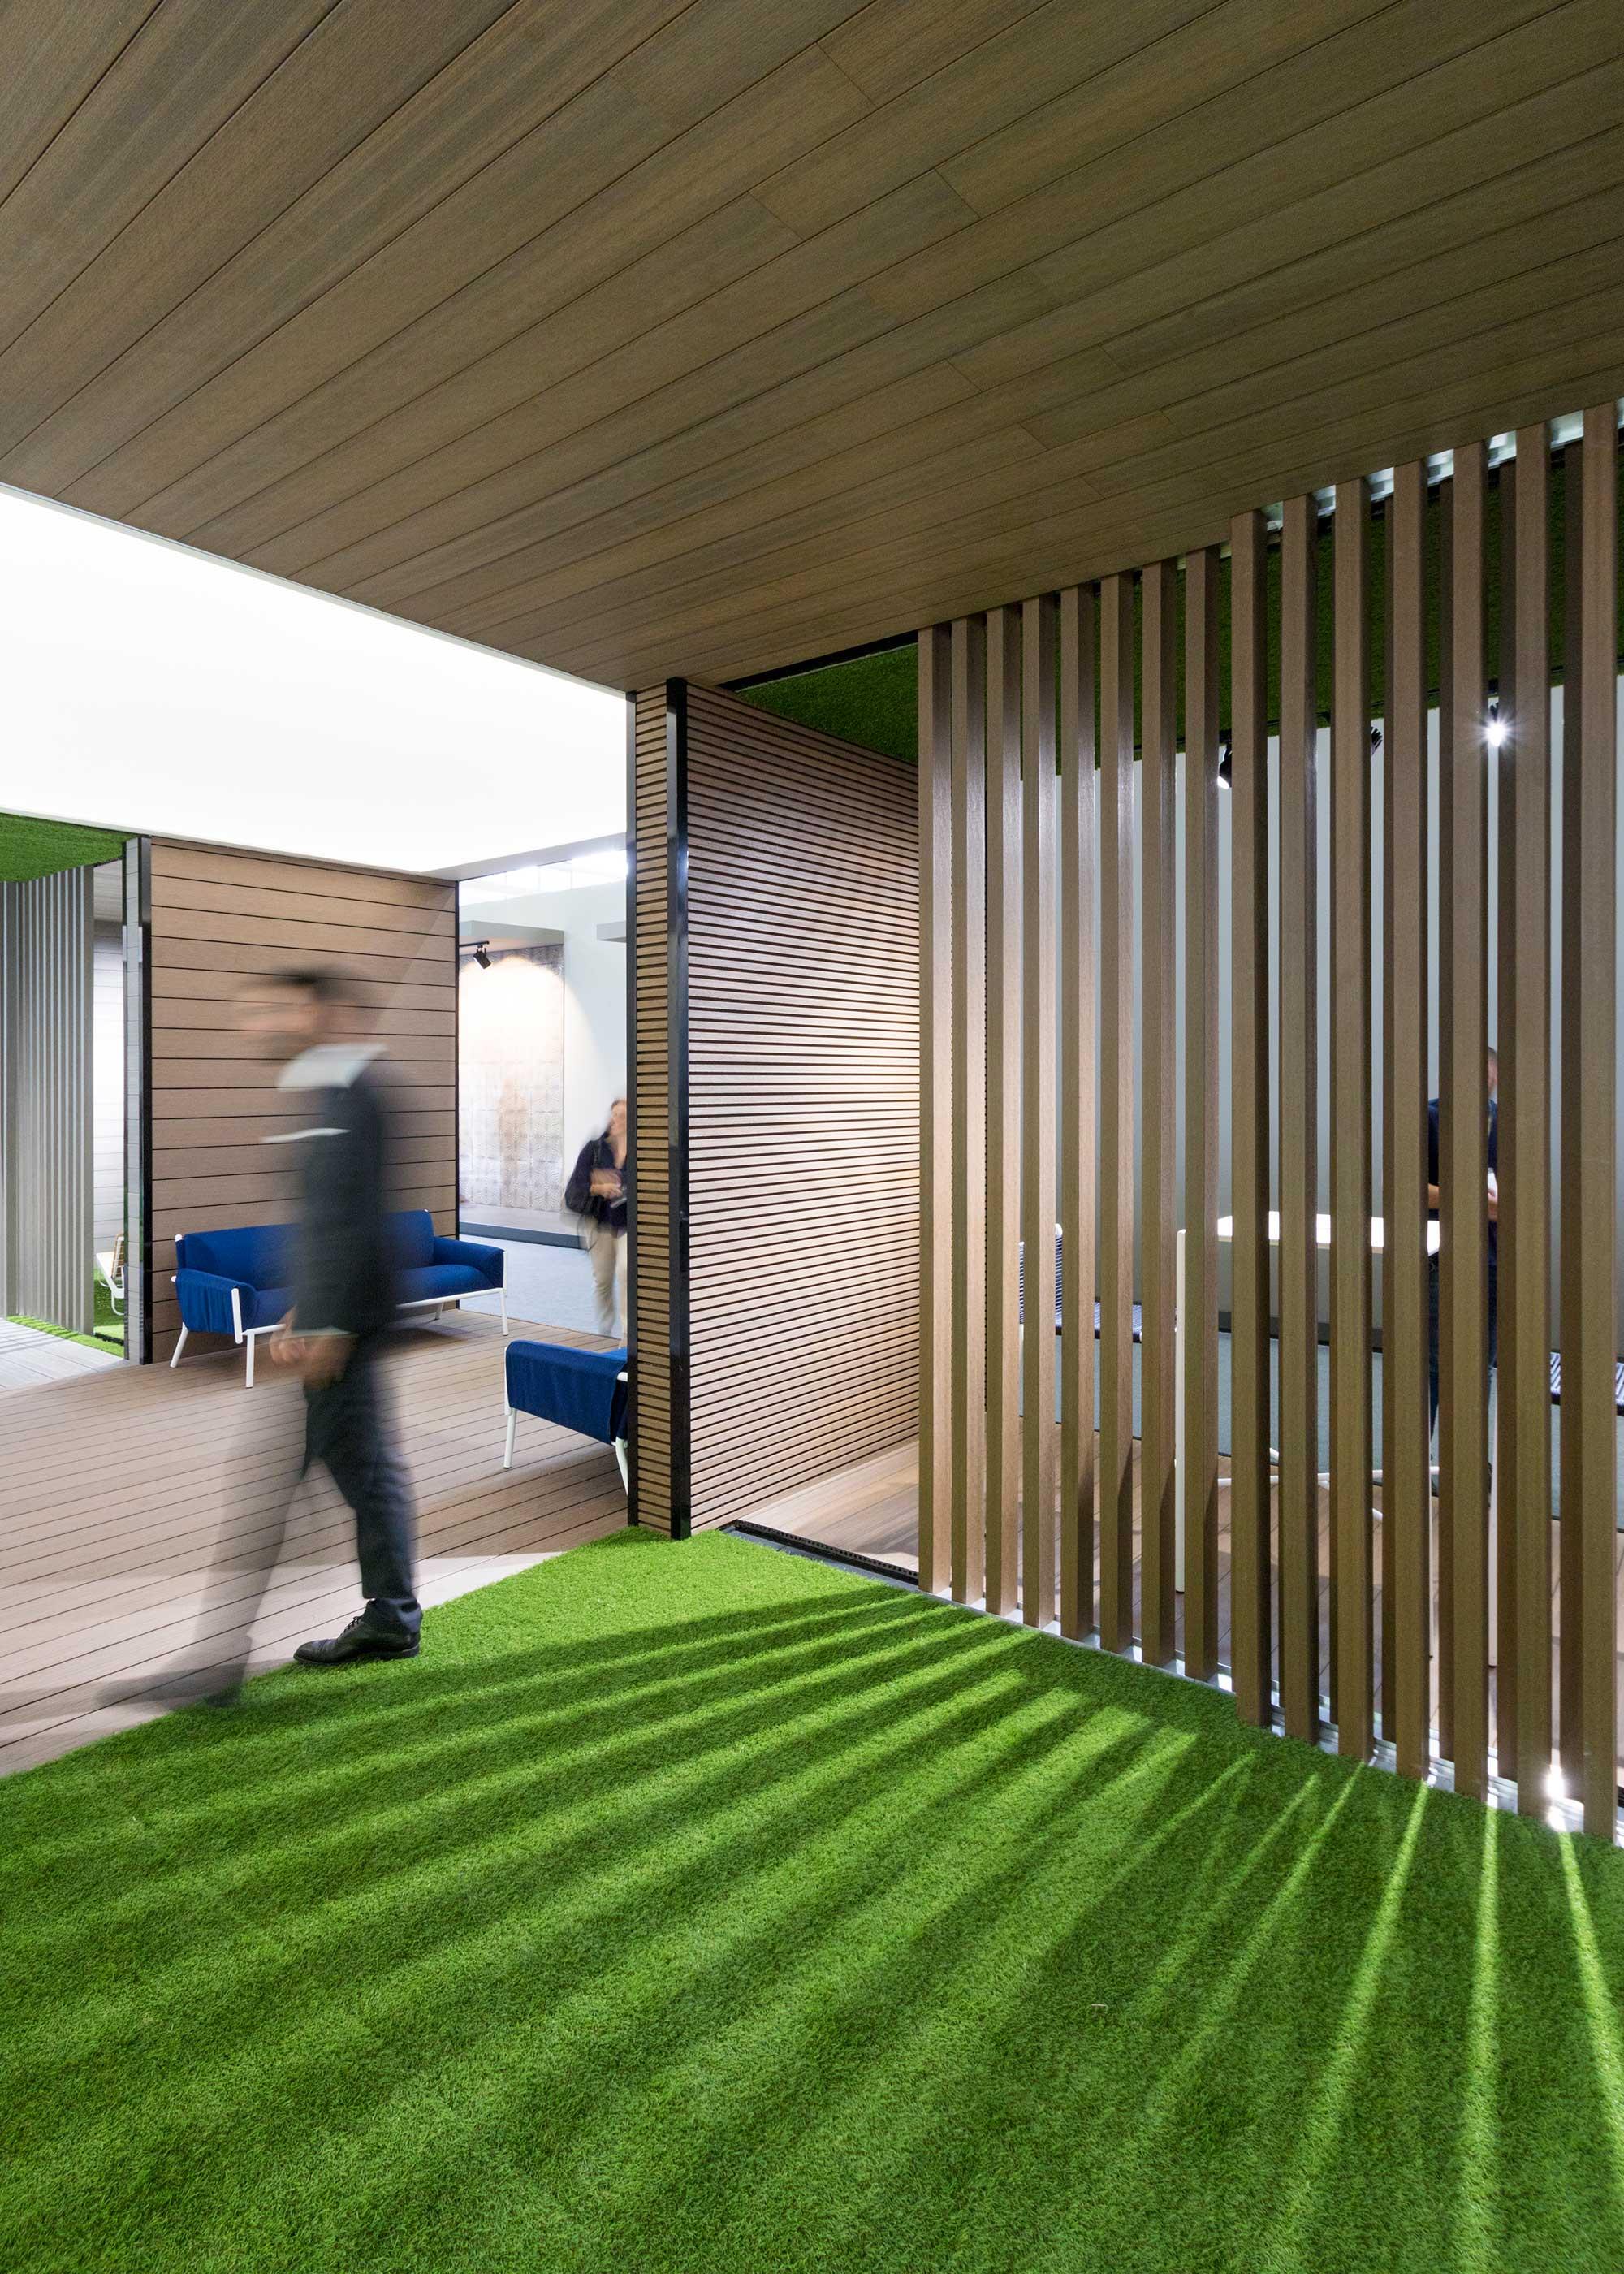 Stand Cersaie Rooms Deco, architettura